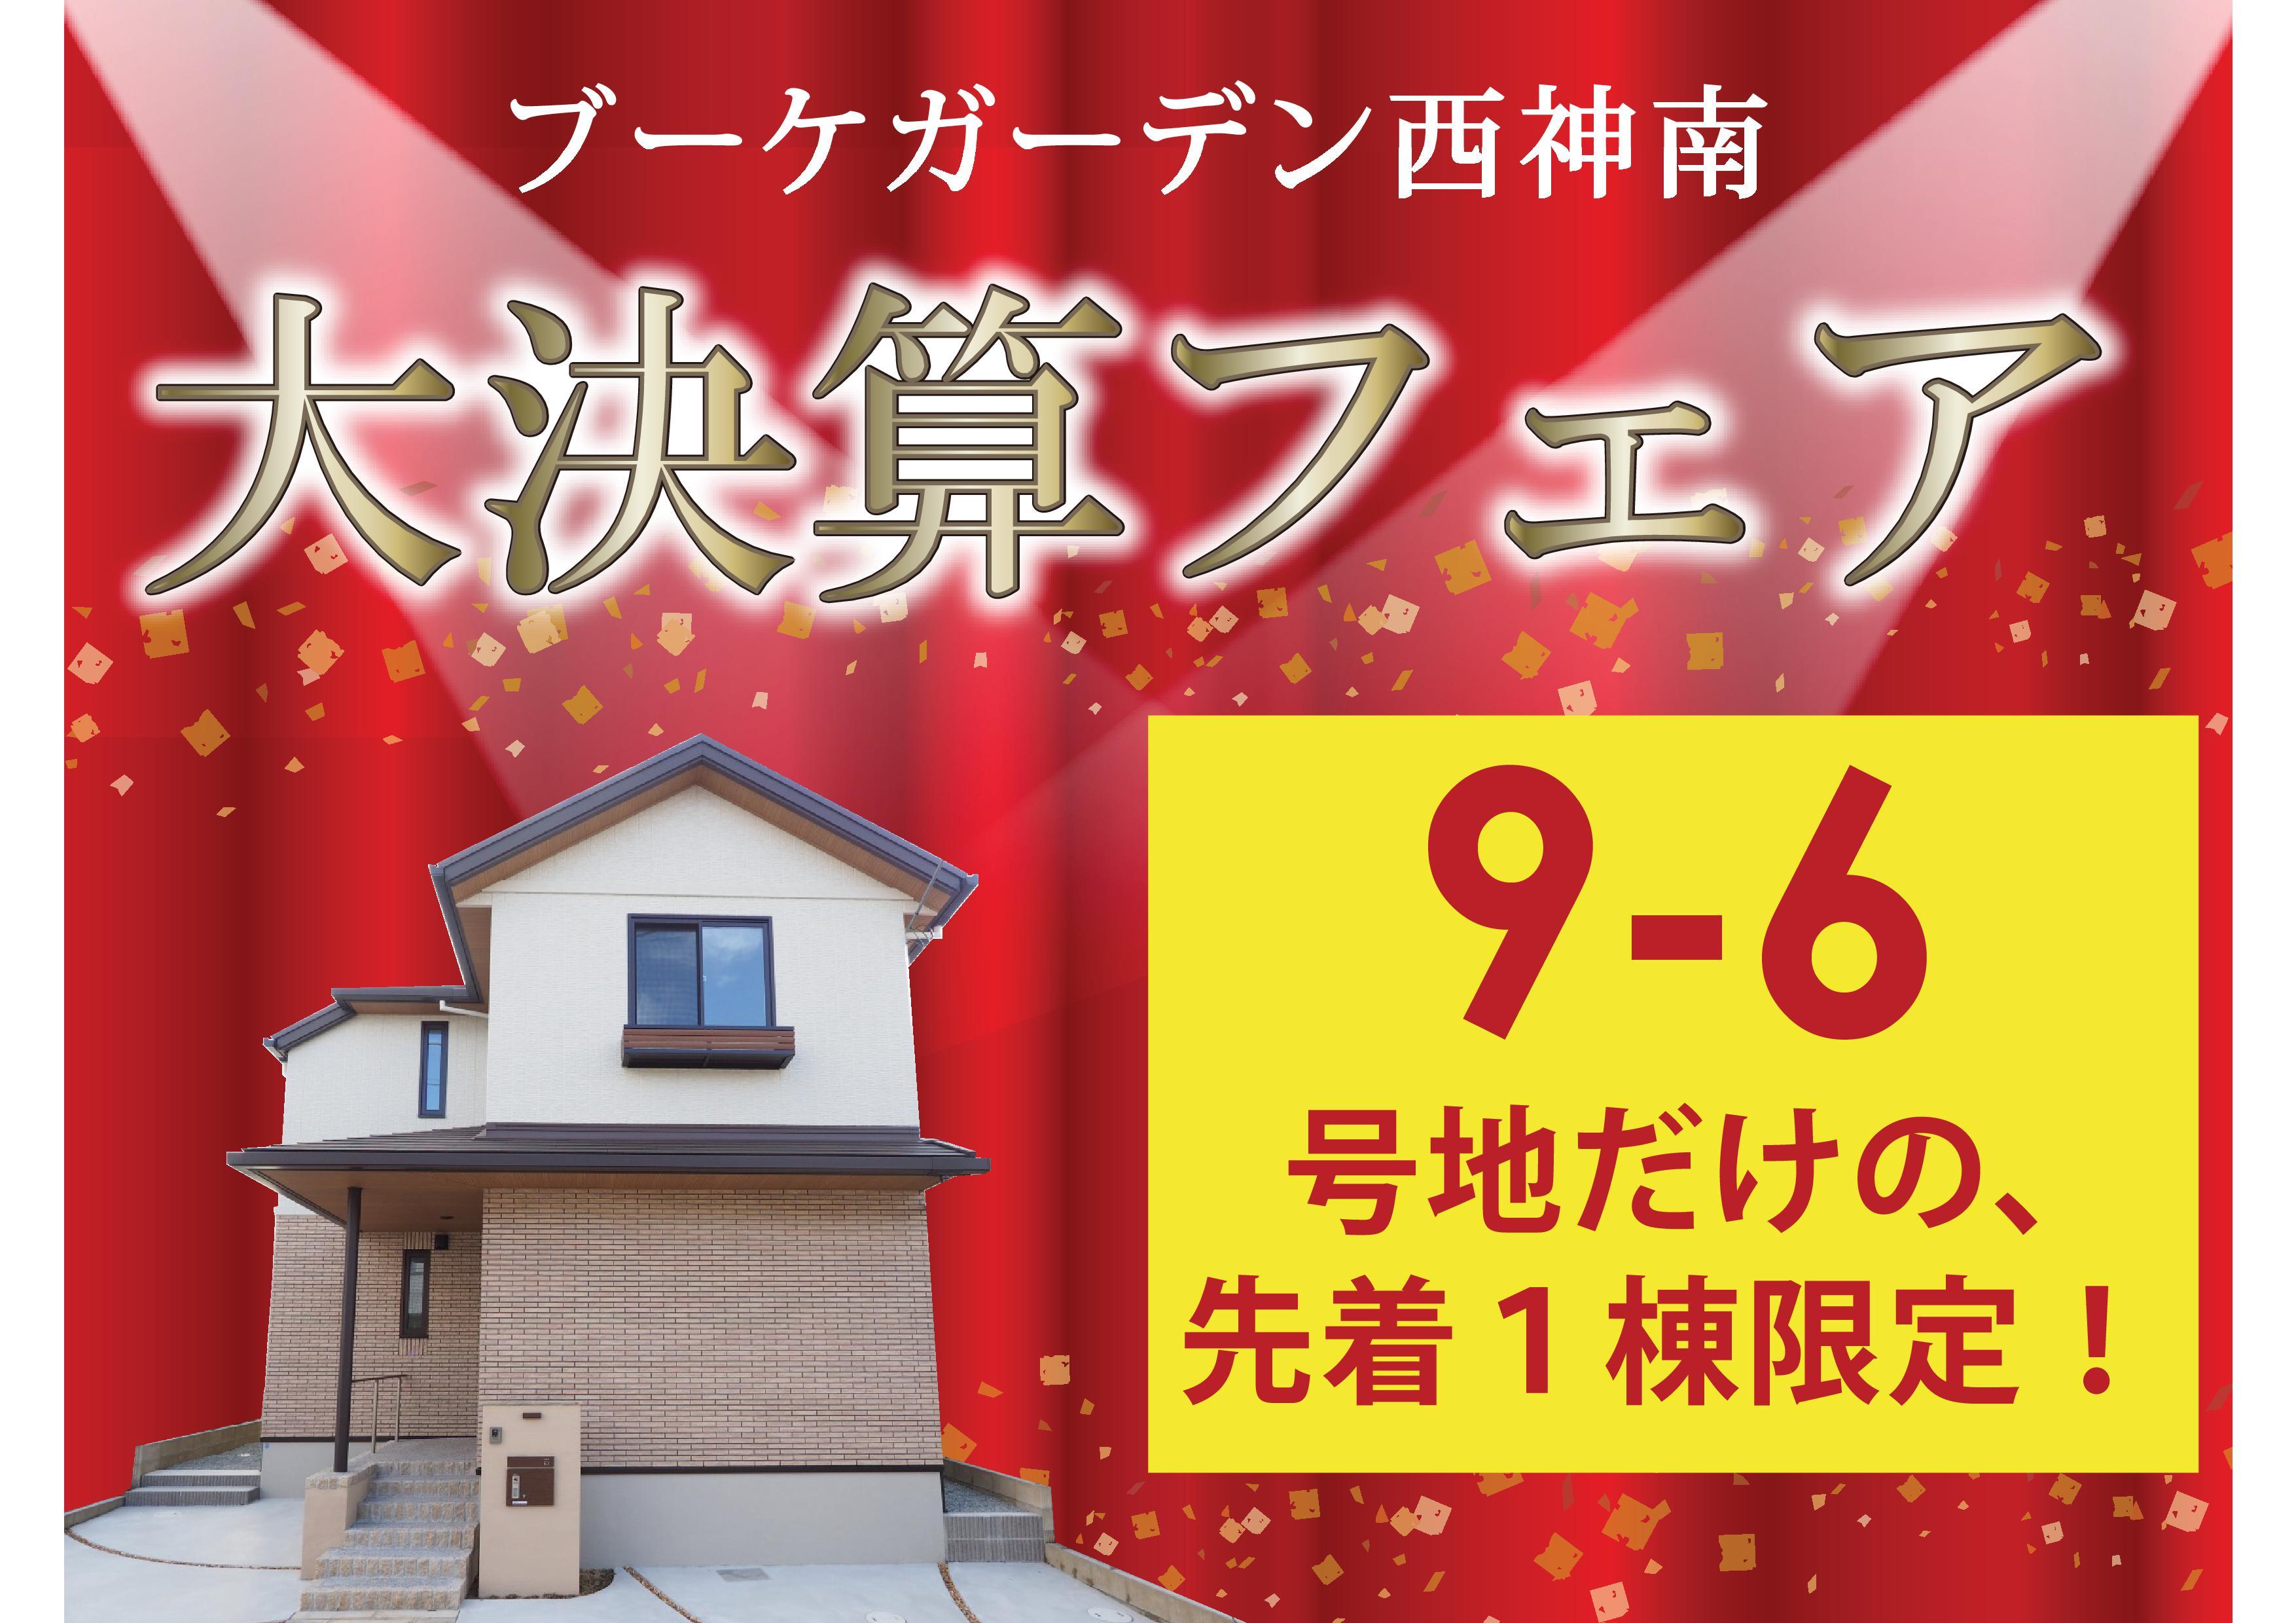 春休み入居応援!神戸・西神南限定1邸特別価格サムネイル画像